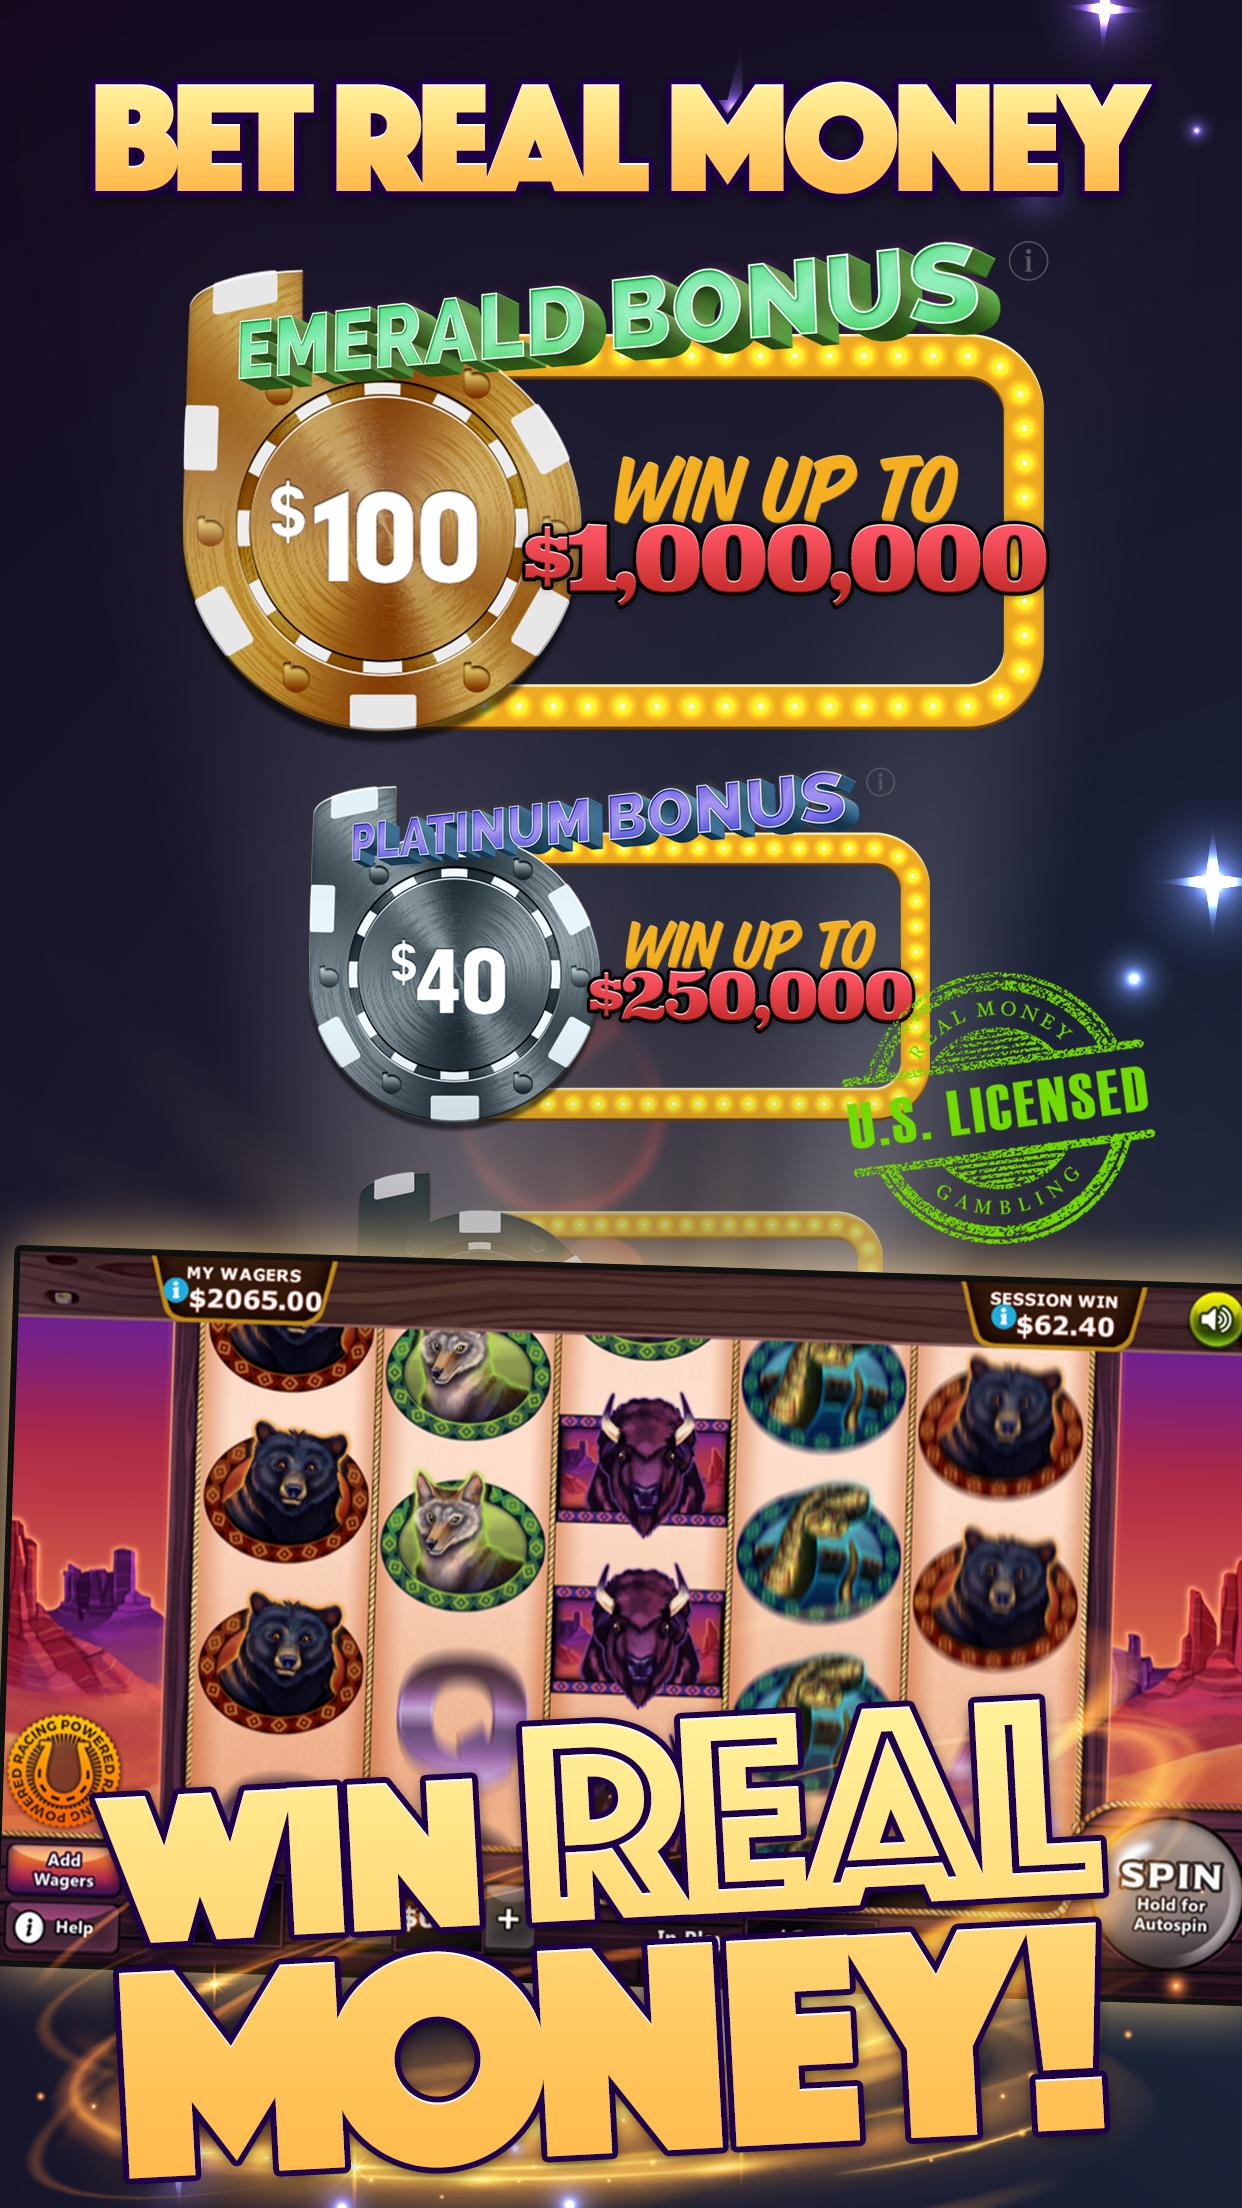 b spot Real Money Gambling Screenshot